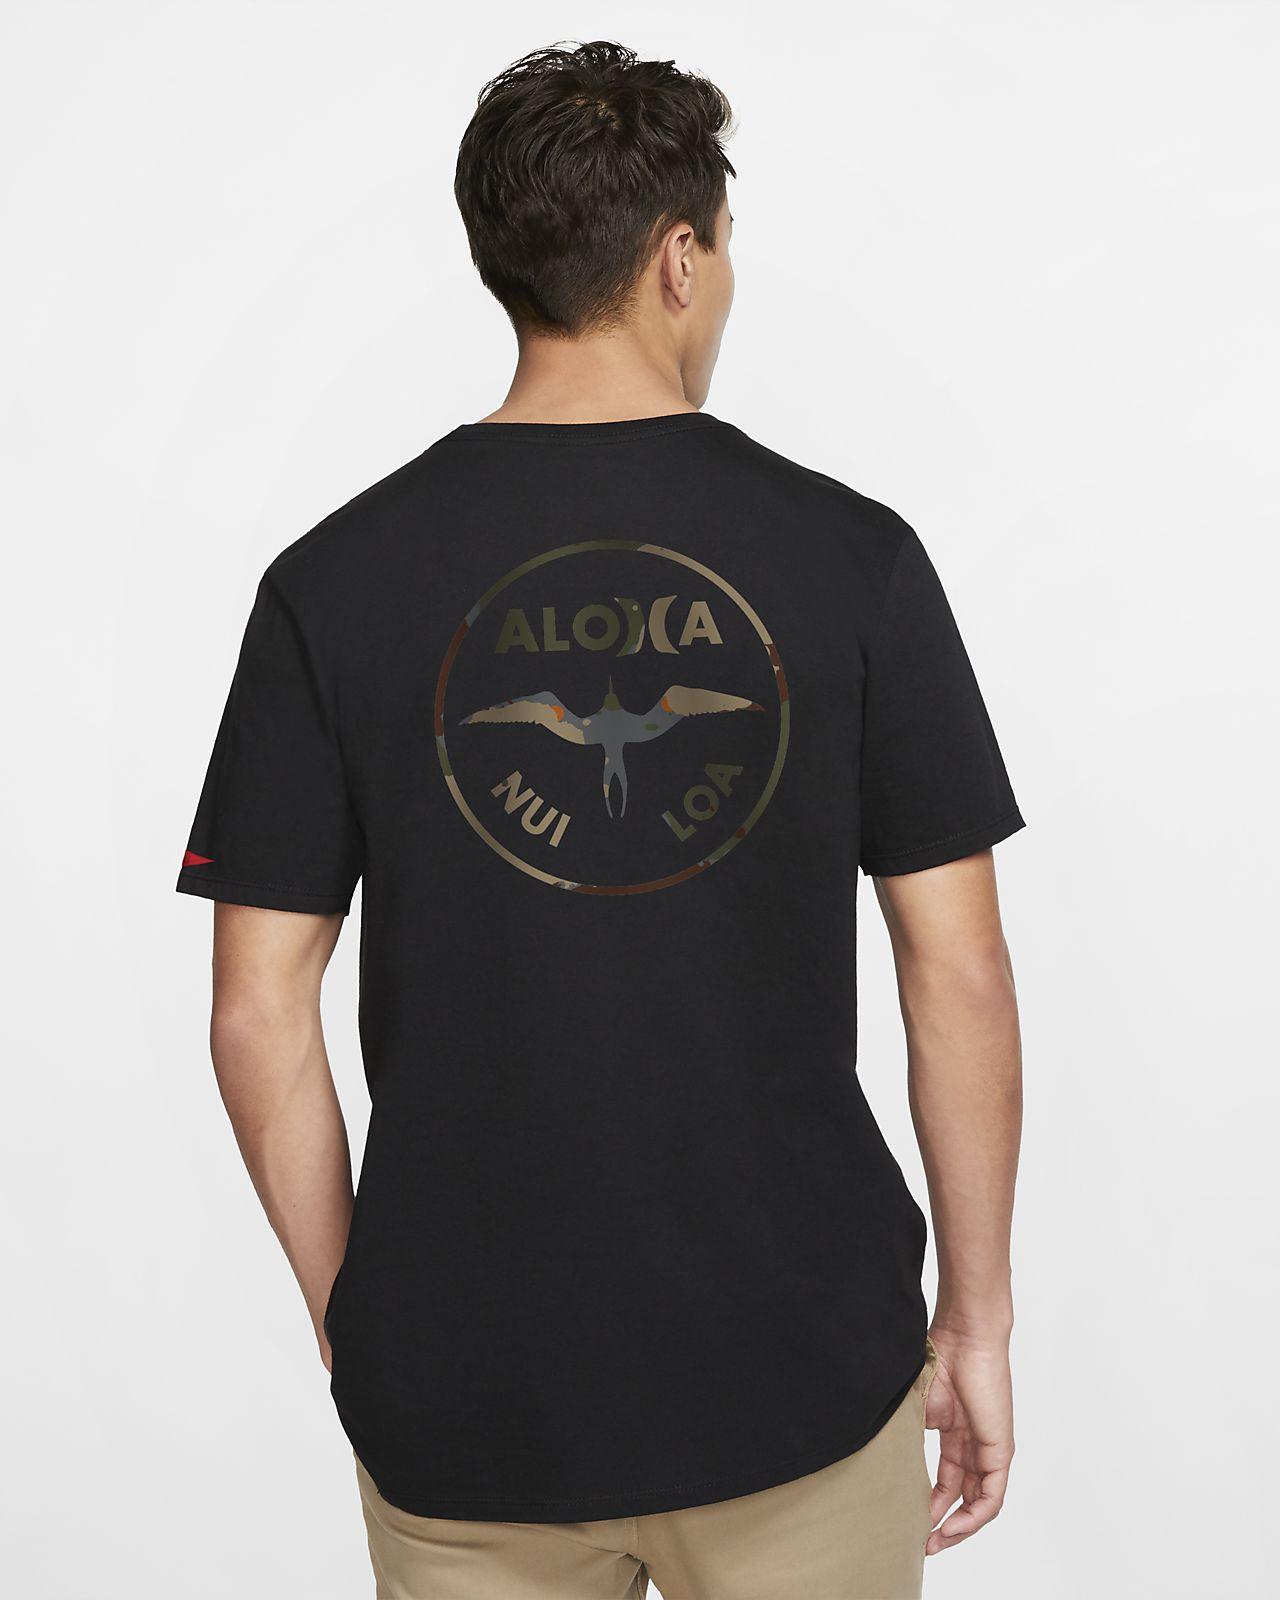 Playera para hombre Hurley Premium JJF Aloha